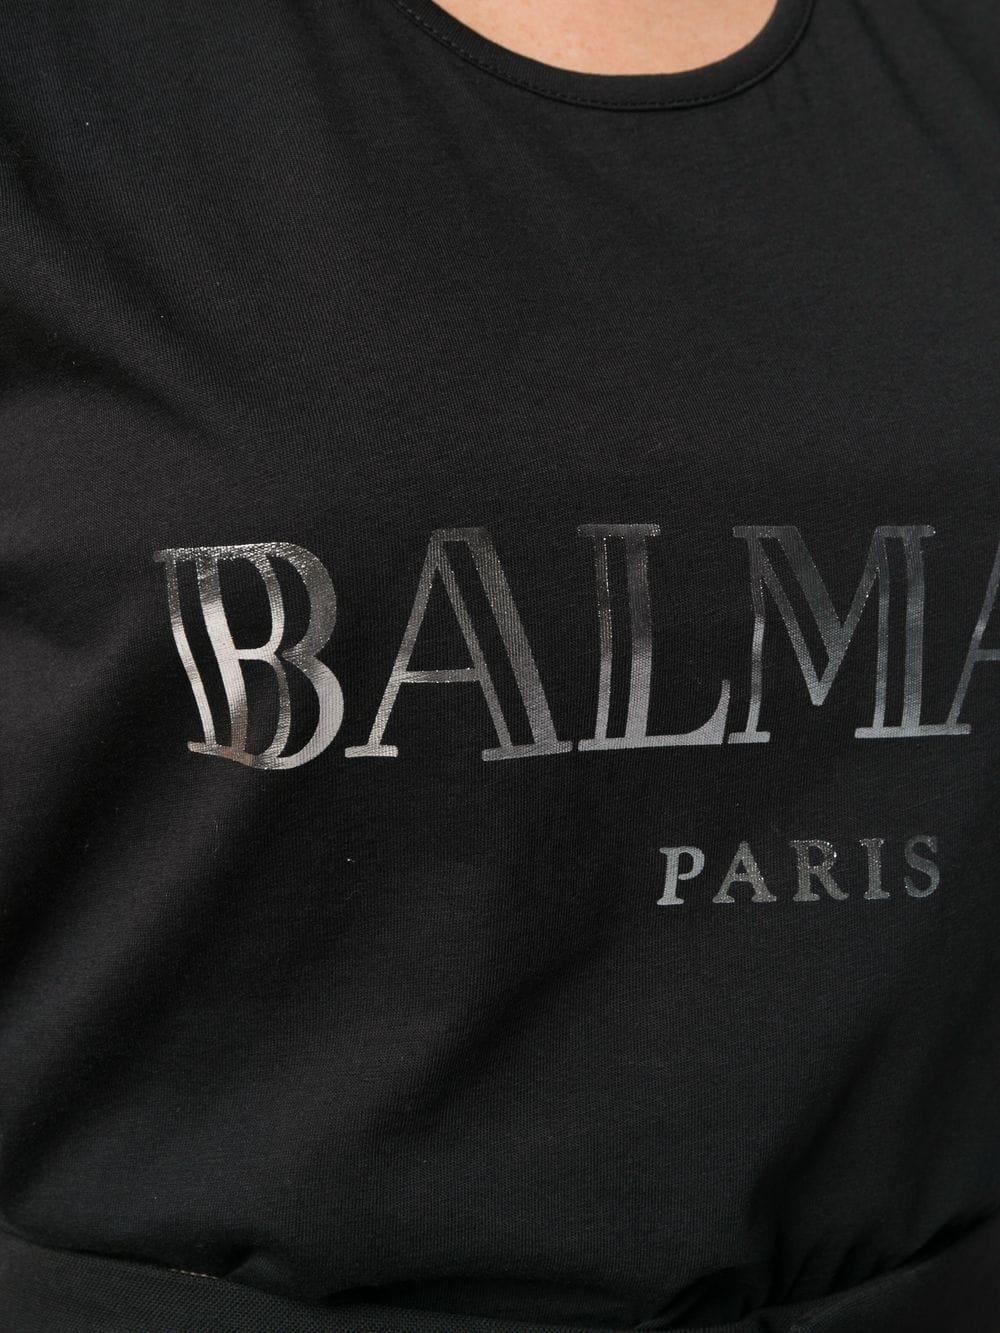 d50933b8efa0bb Balmain Logo Print Tank Top in Black - Lyst